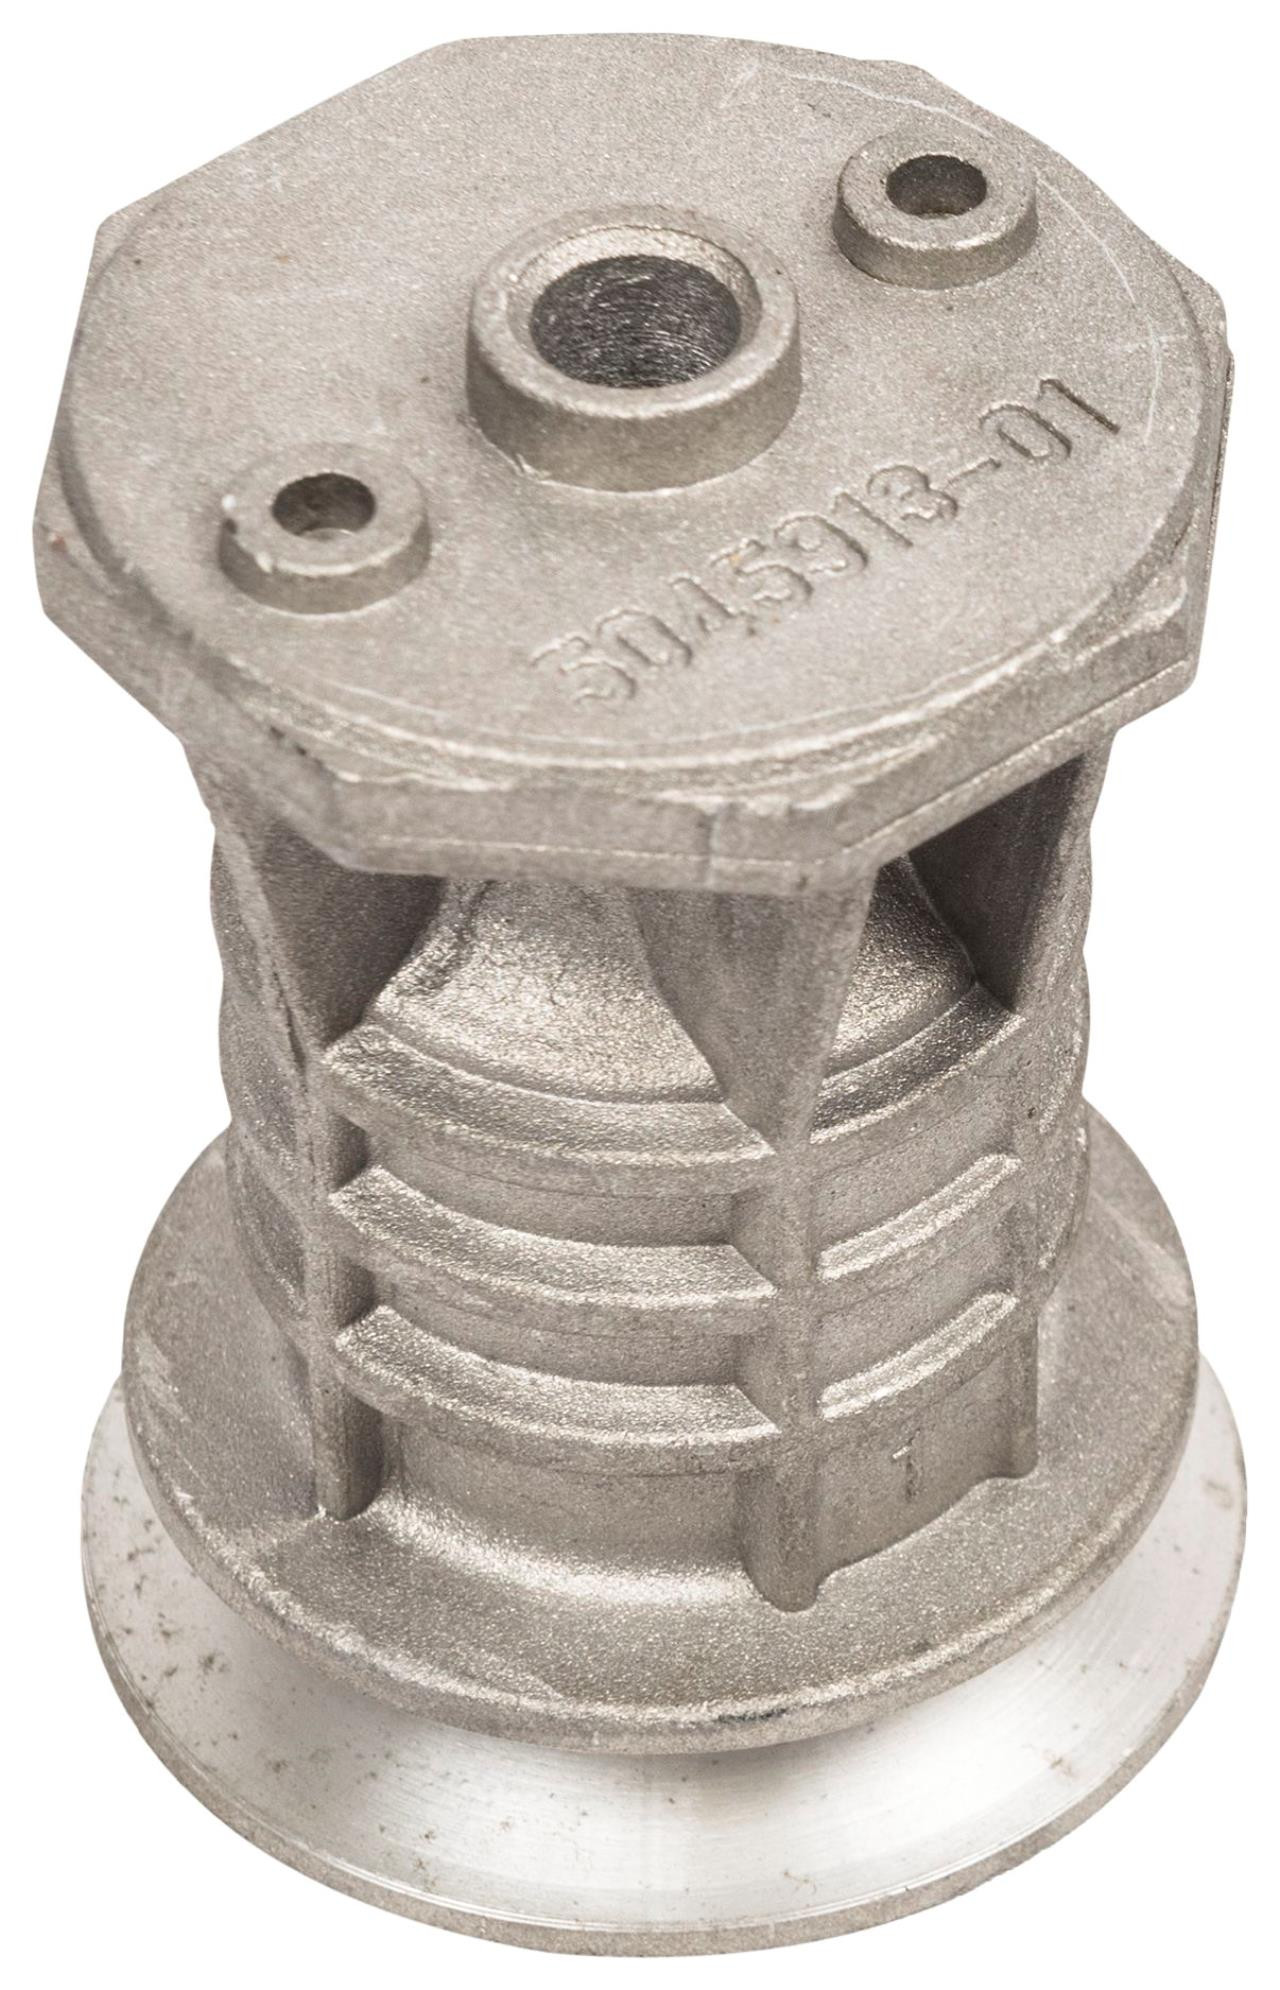 Husqvarna knivholder, Ø 25 mm, LC/LB48